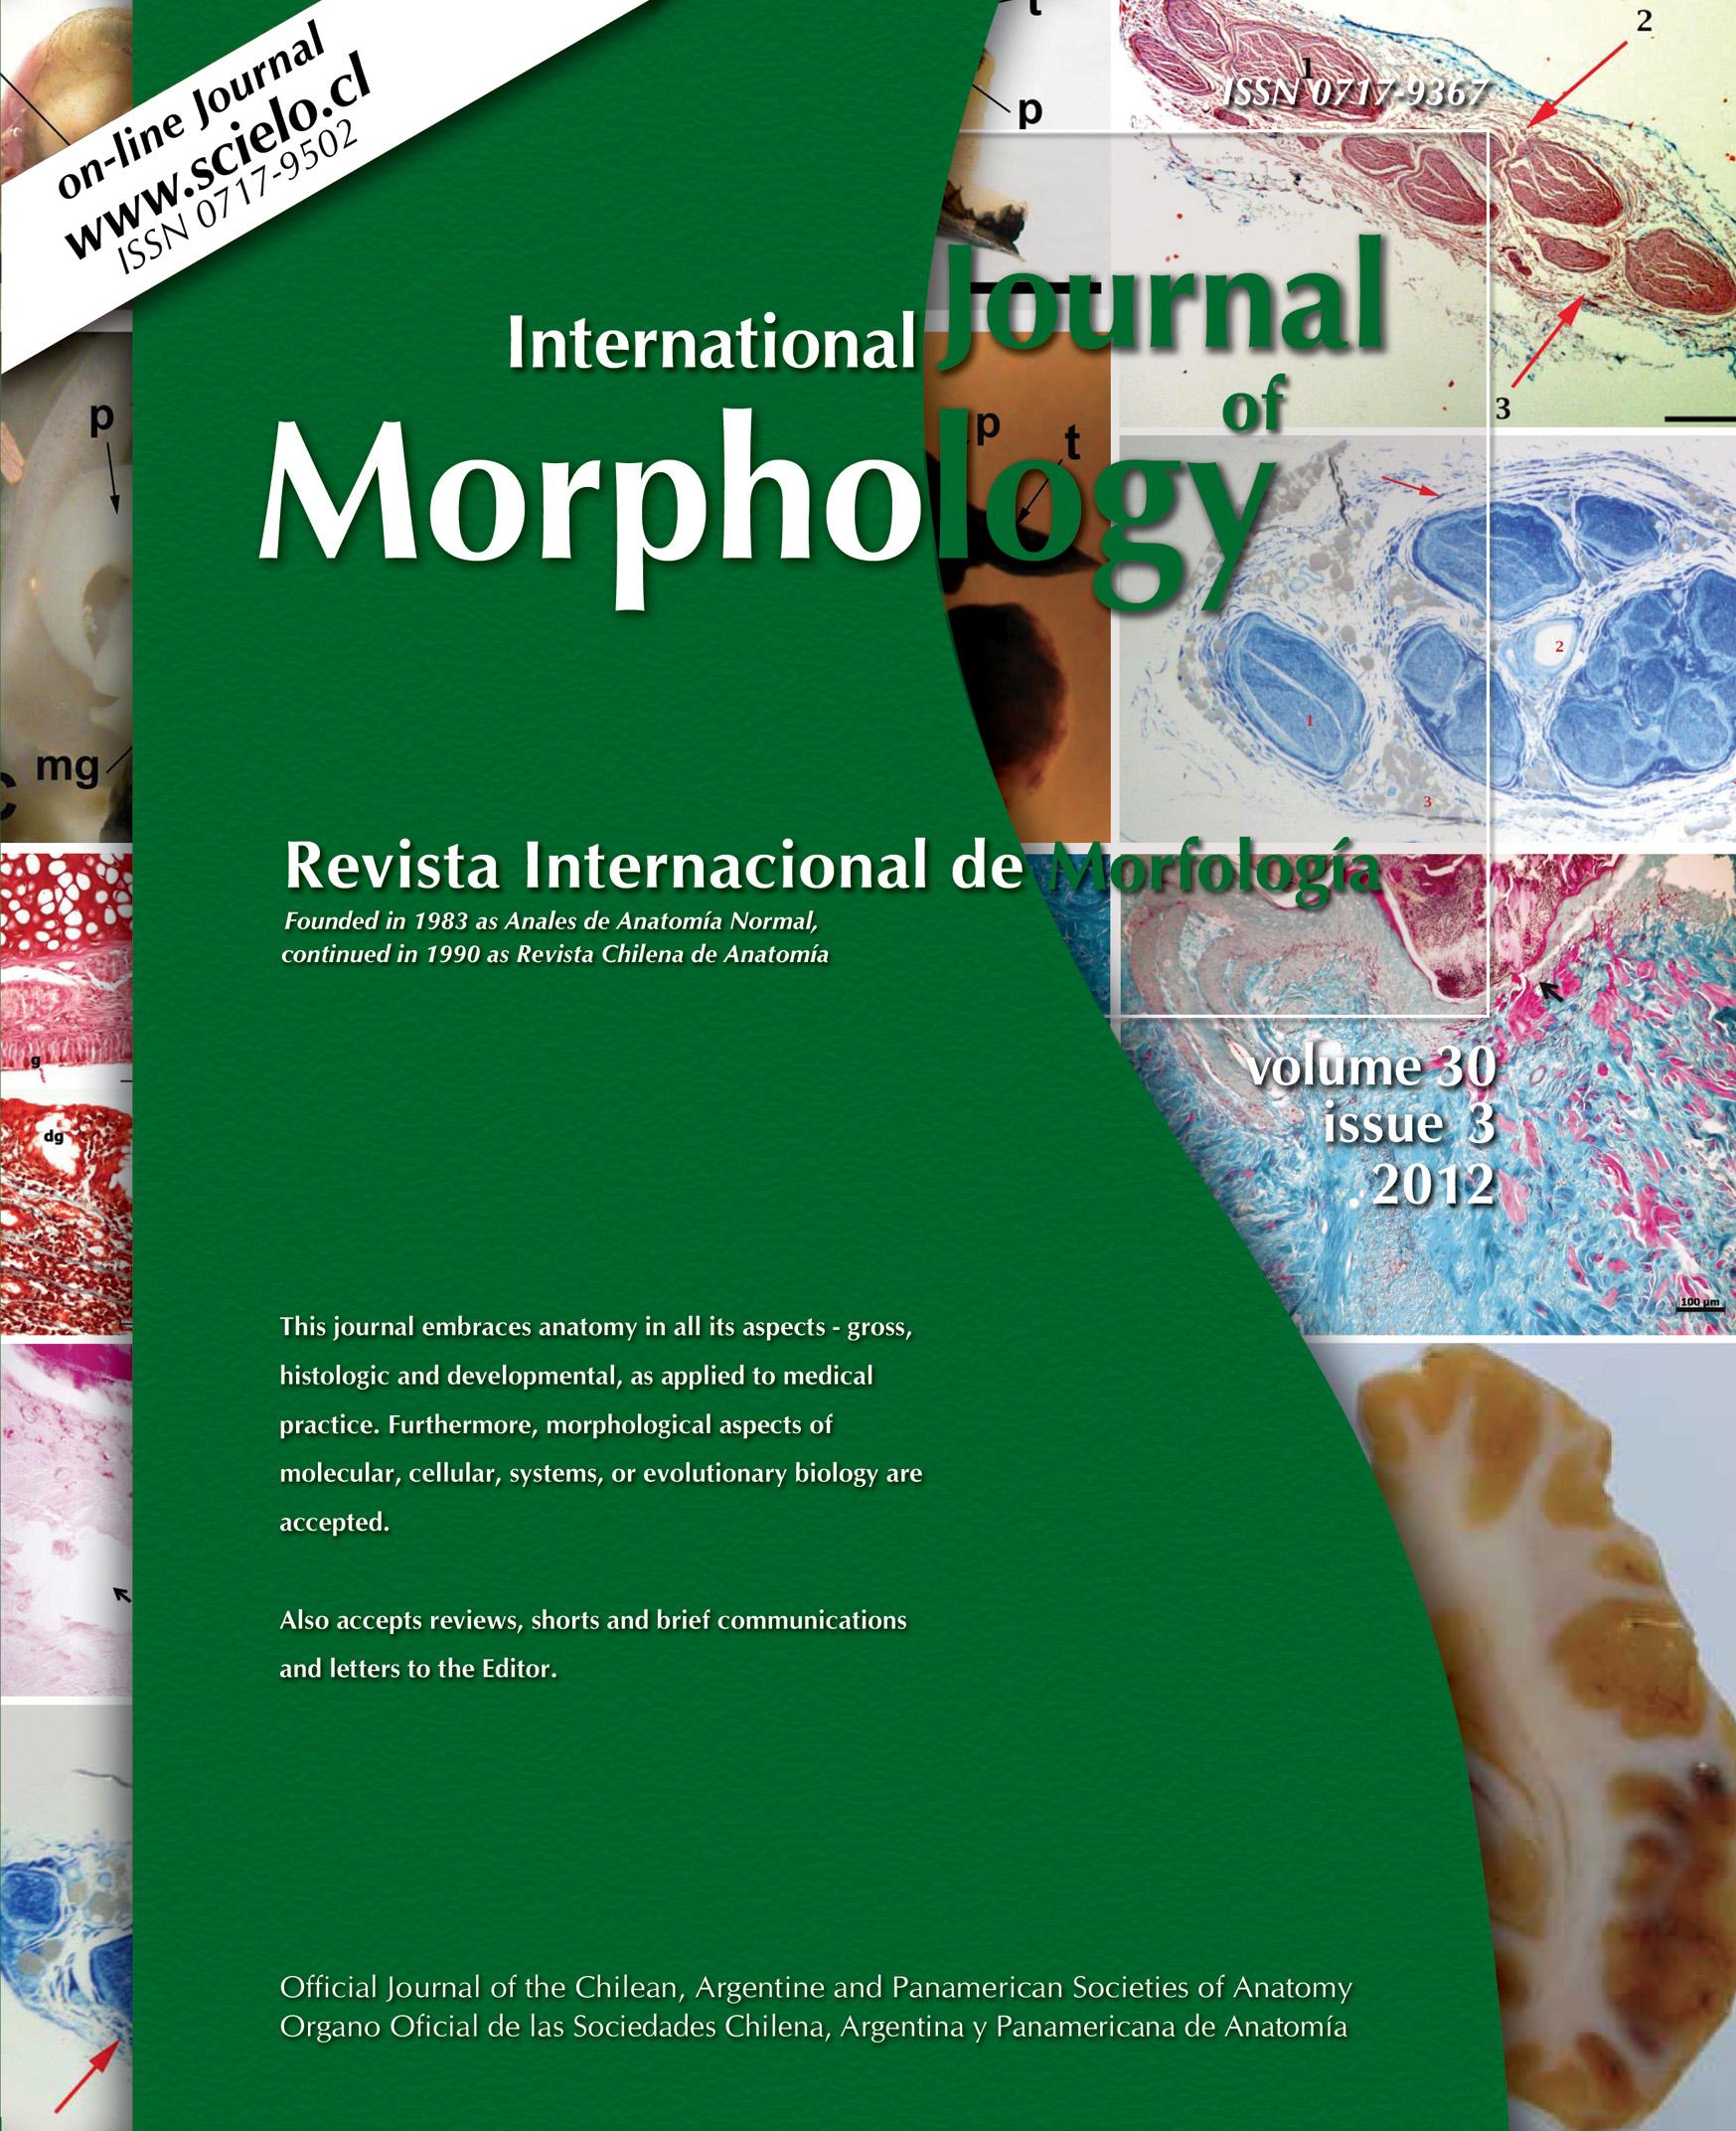 Fascículo 3 Archive - International Journal of Morphology